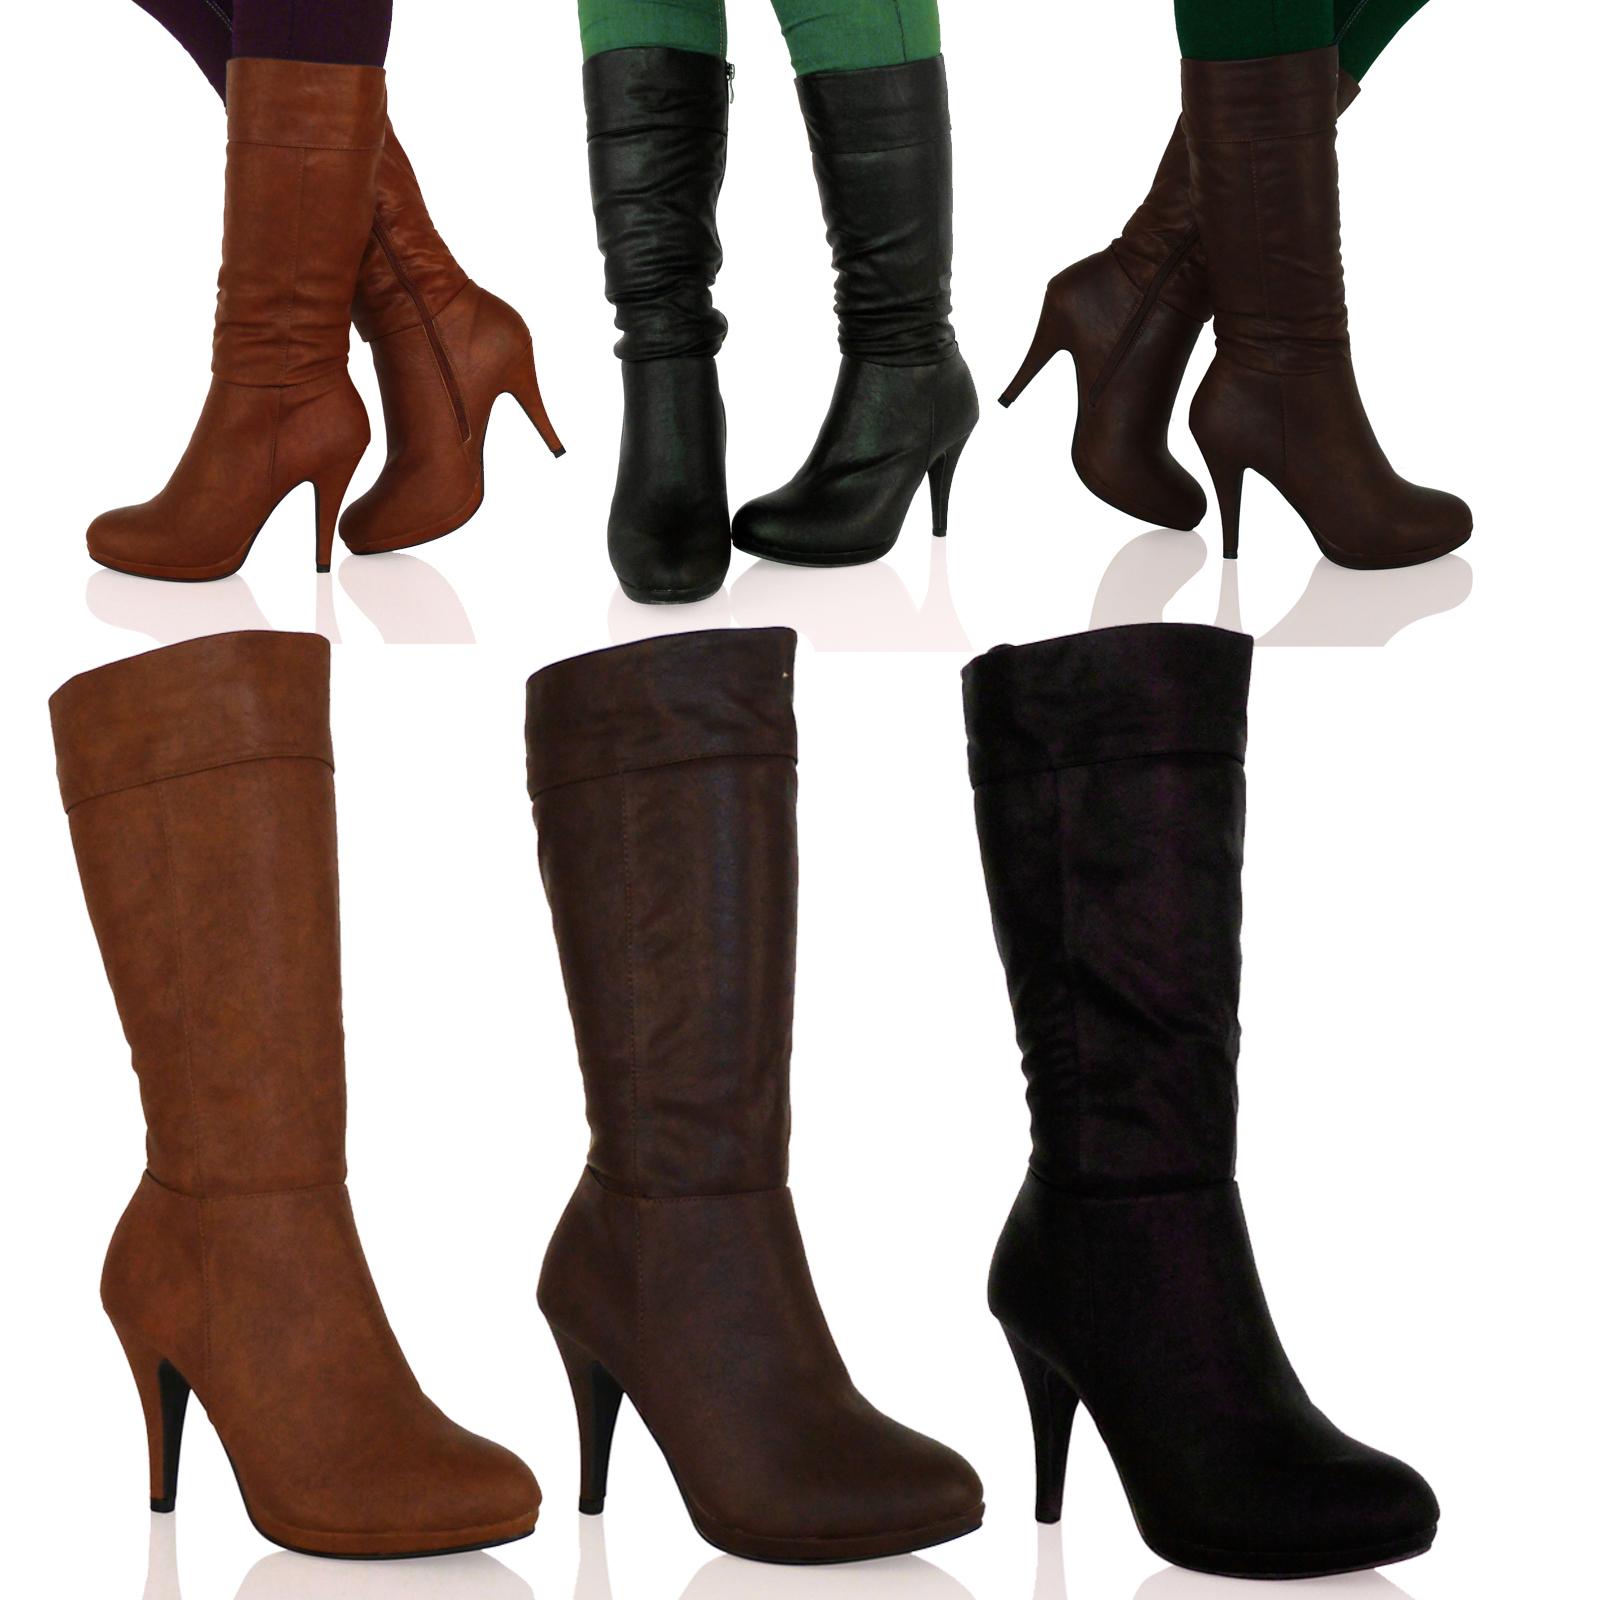 D8Z Womens Mid High Stiletto Heel Mid Calf Under Knee Boots ...